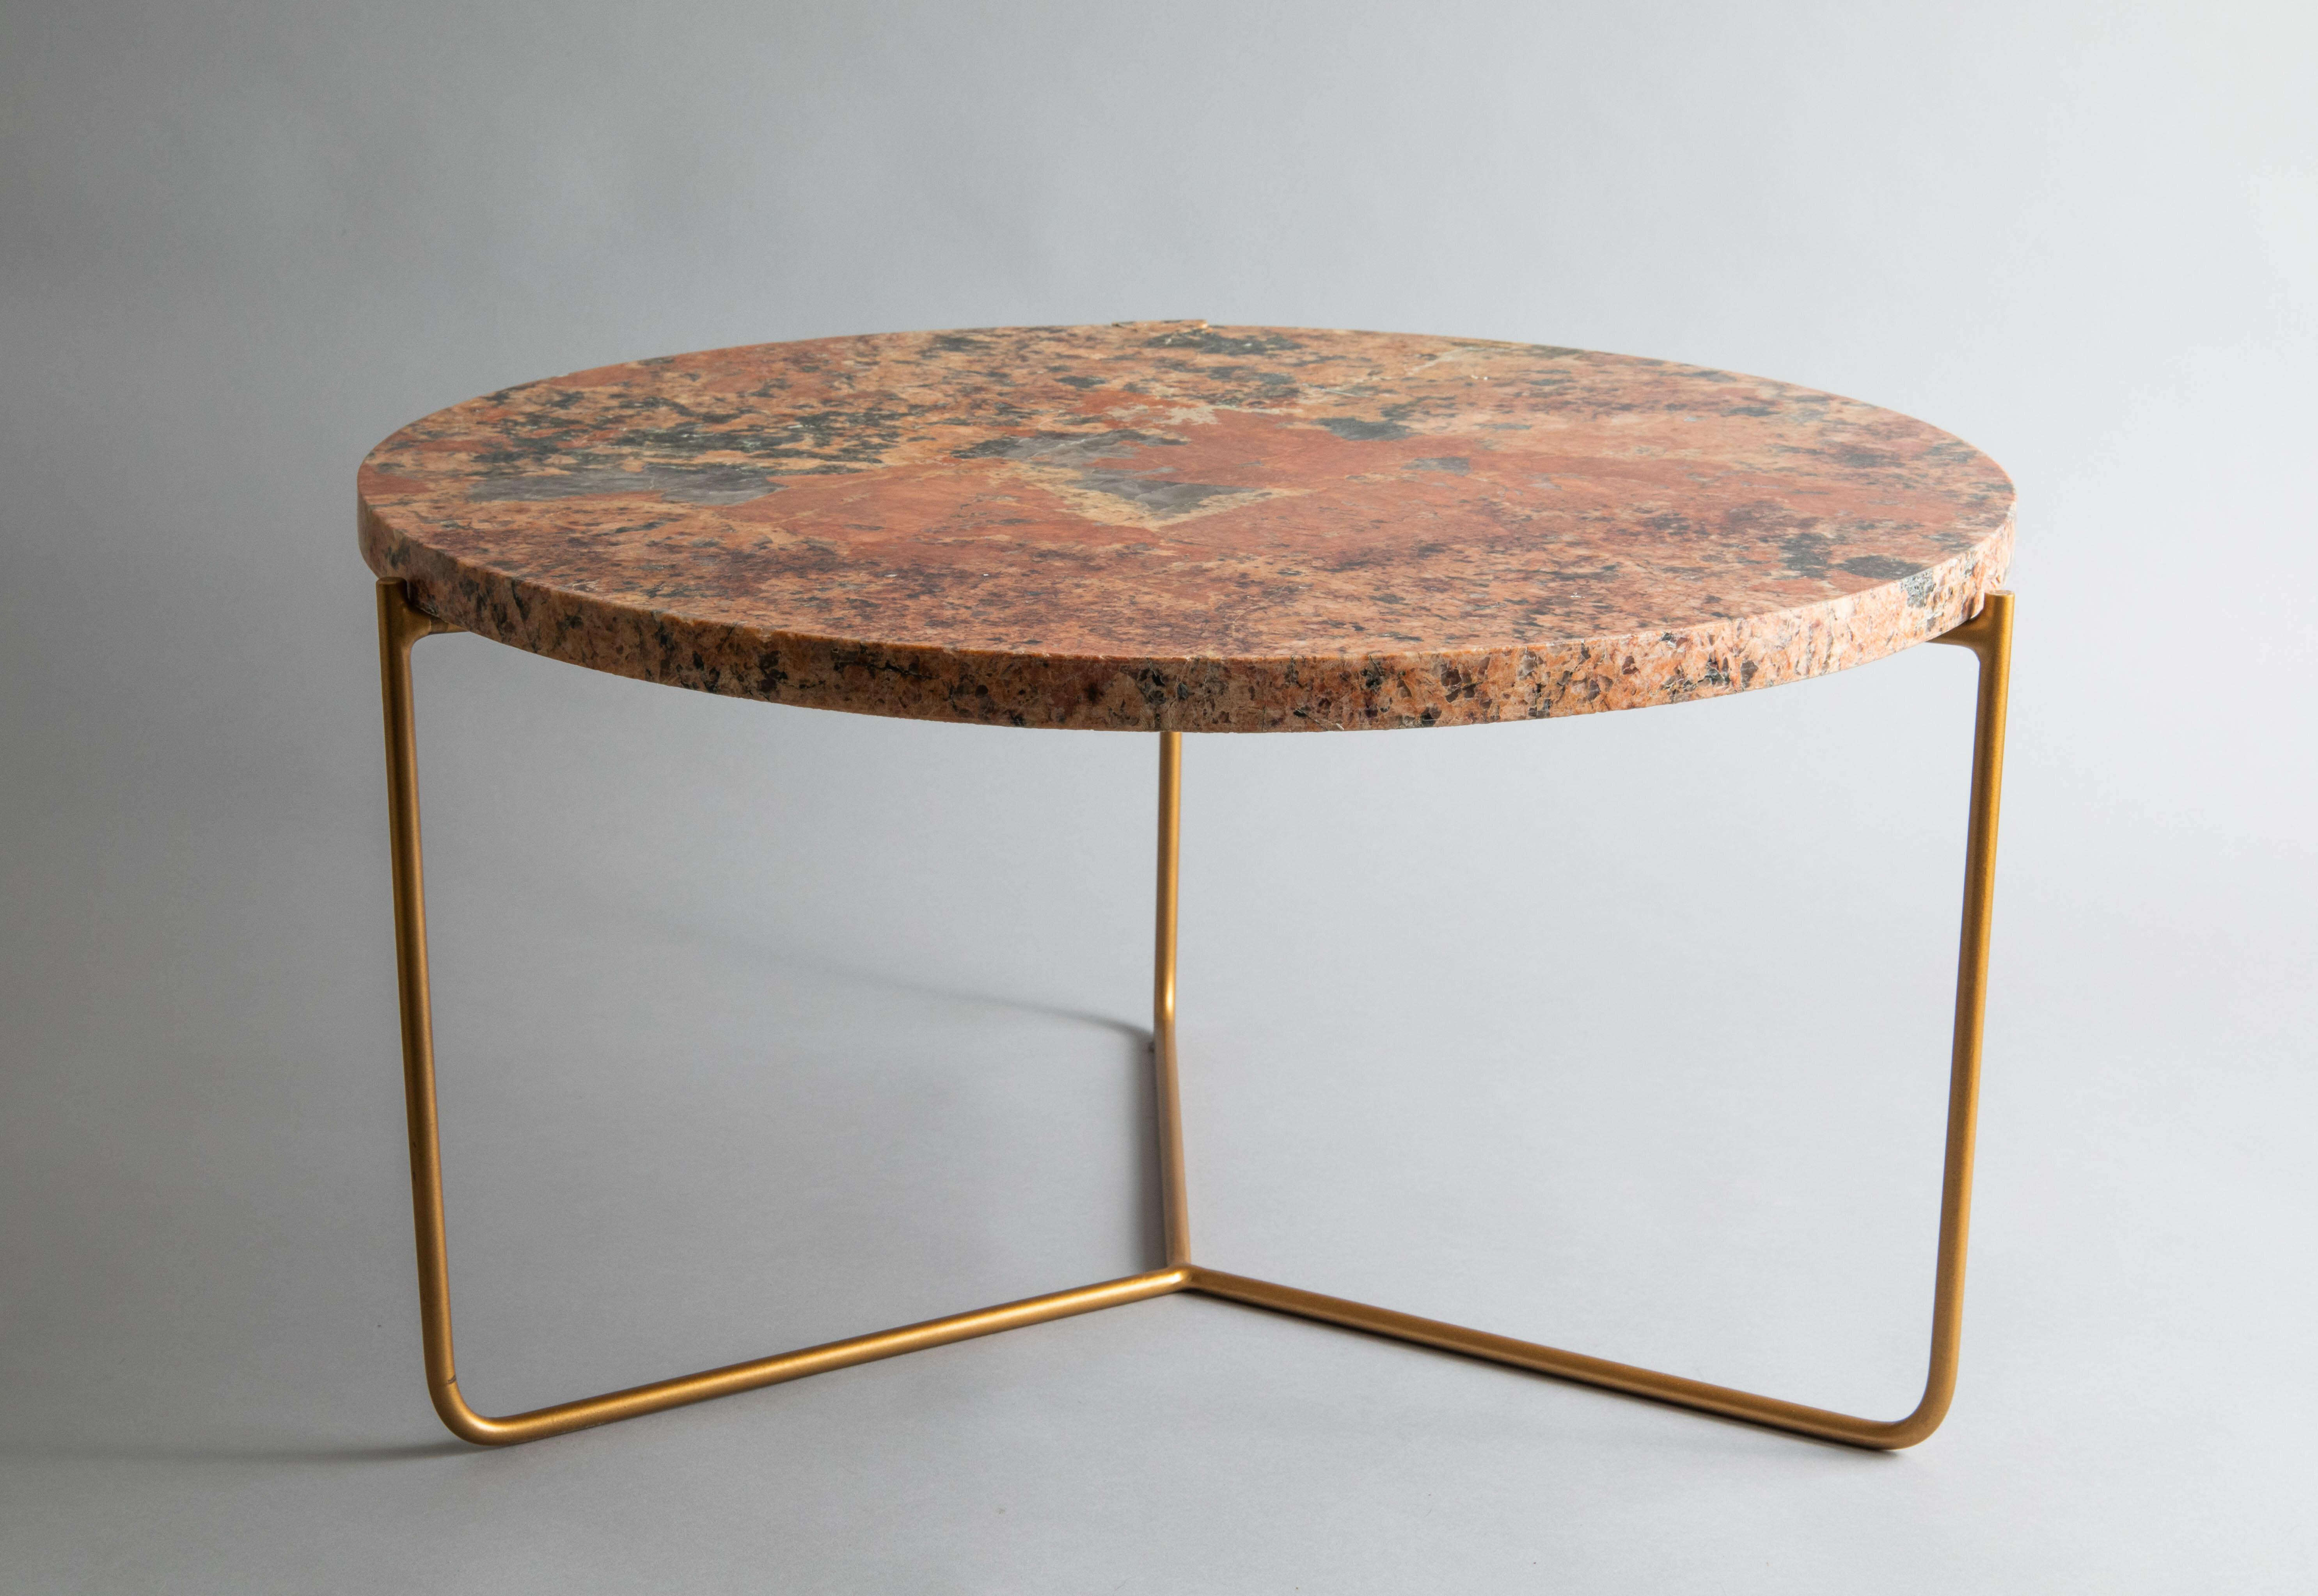 Mercer41 Eberly Frame Coffee Table Reviews Wayfair